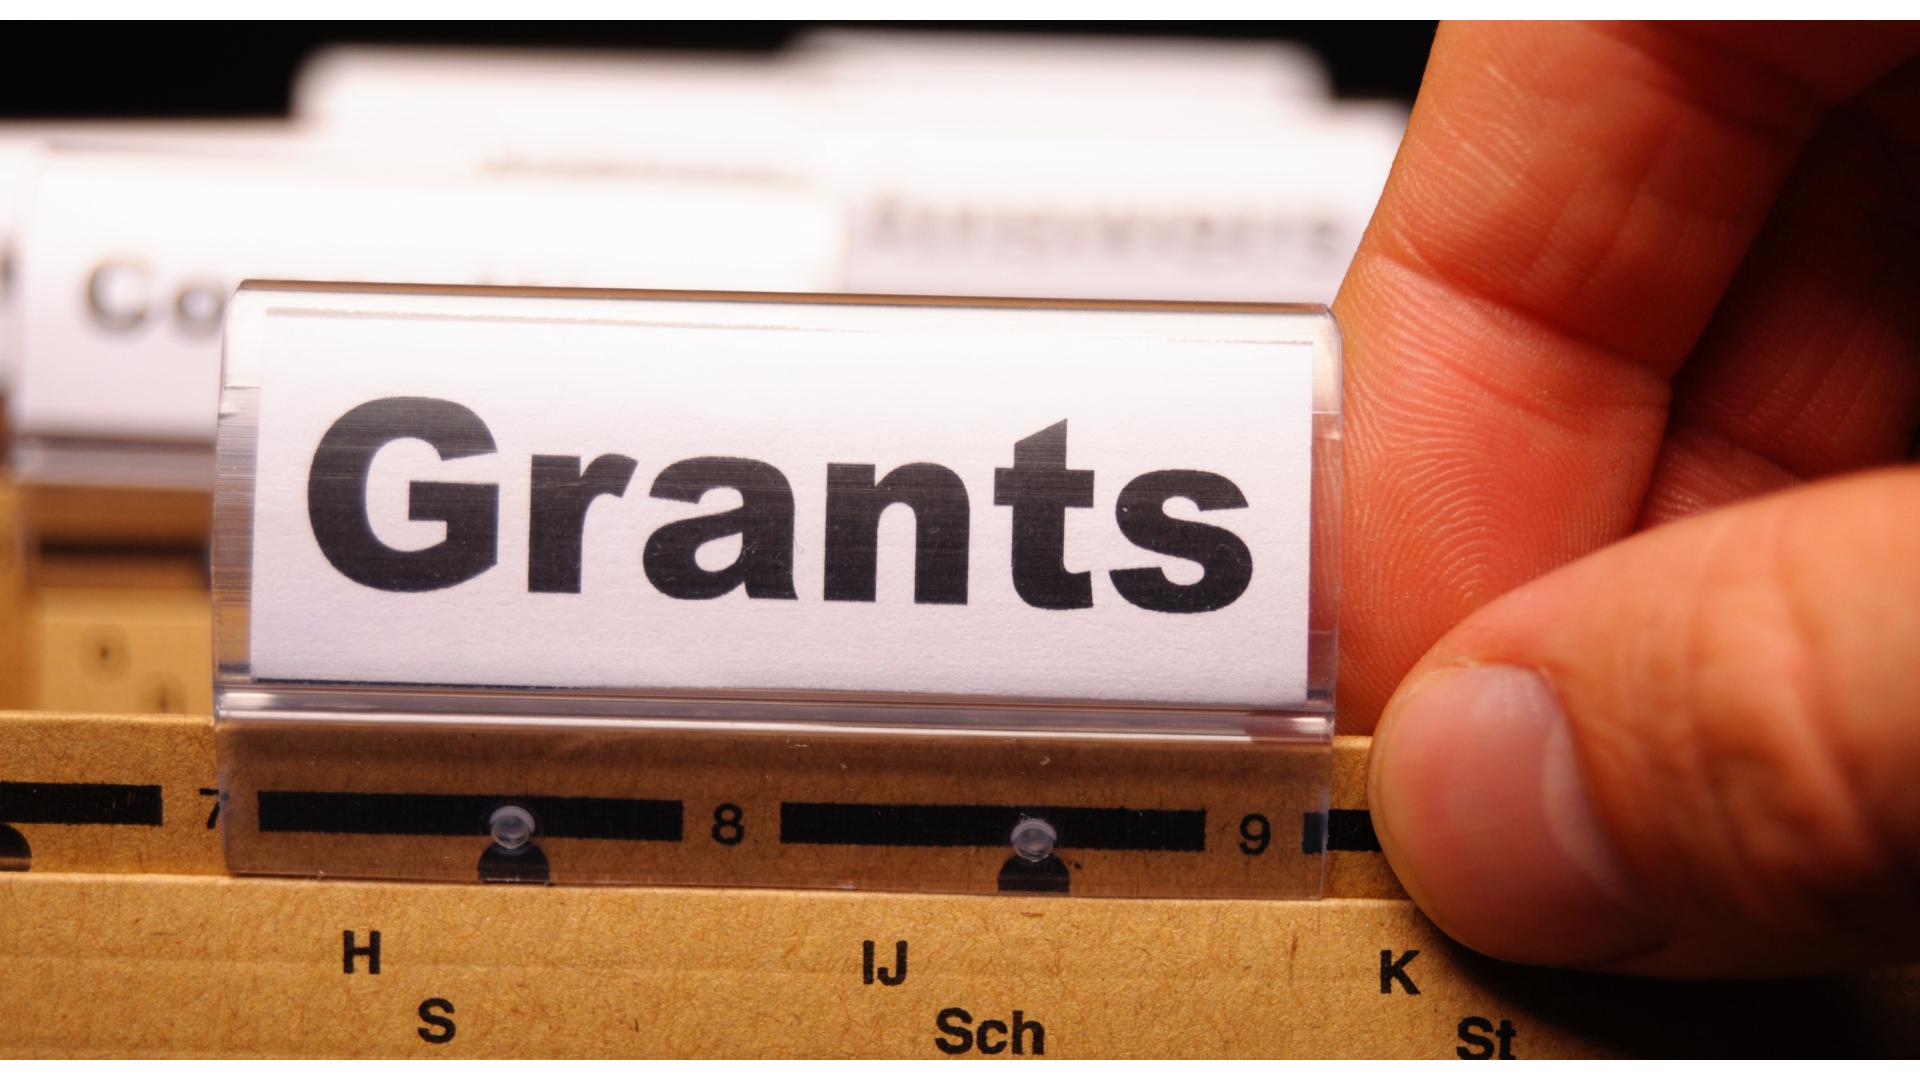 Stress Free Grant Application